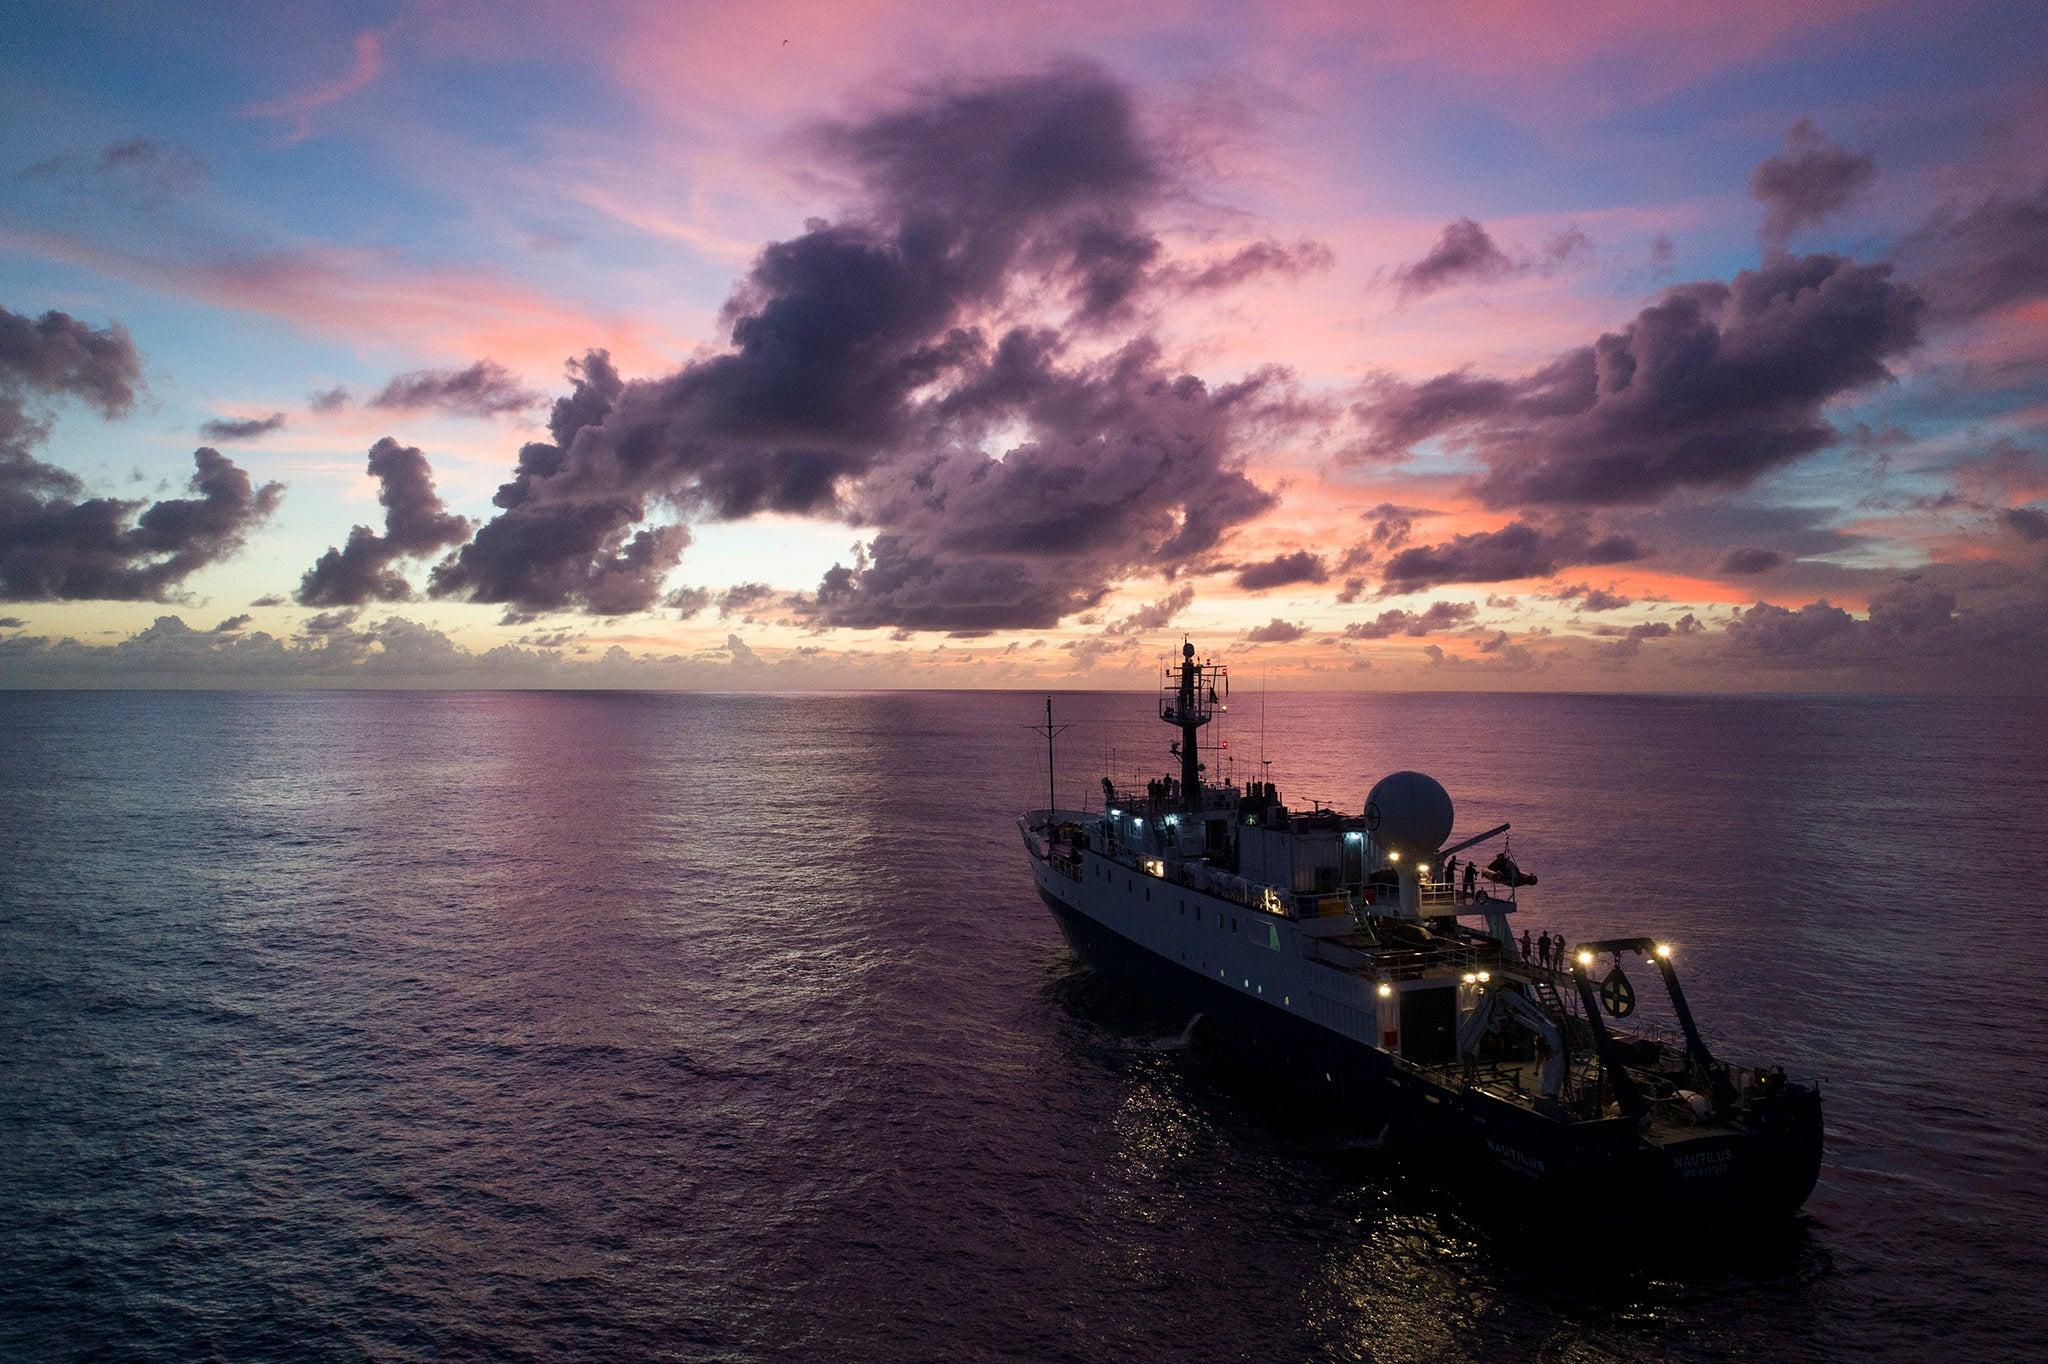 The E/V Nautilus at sea at sunset